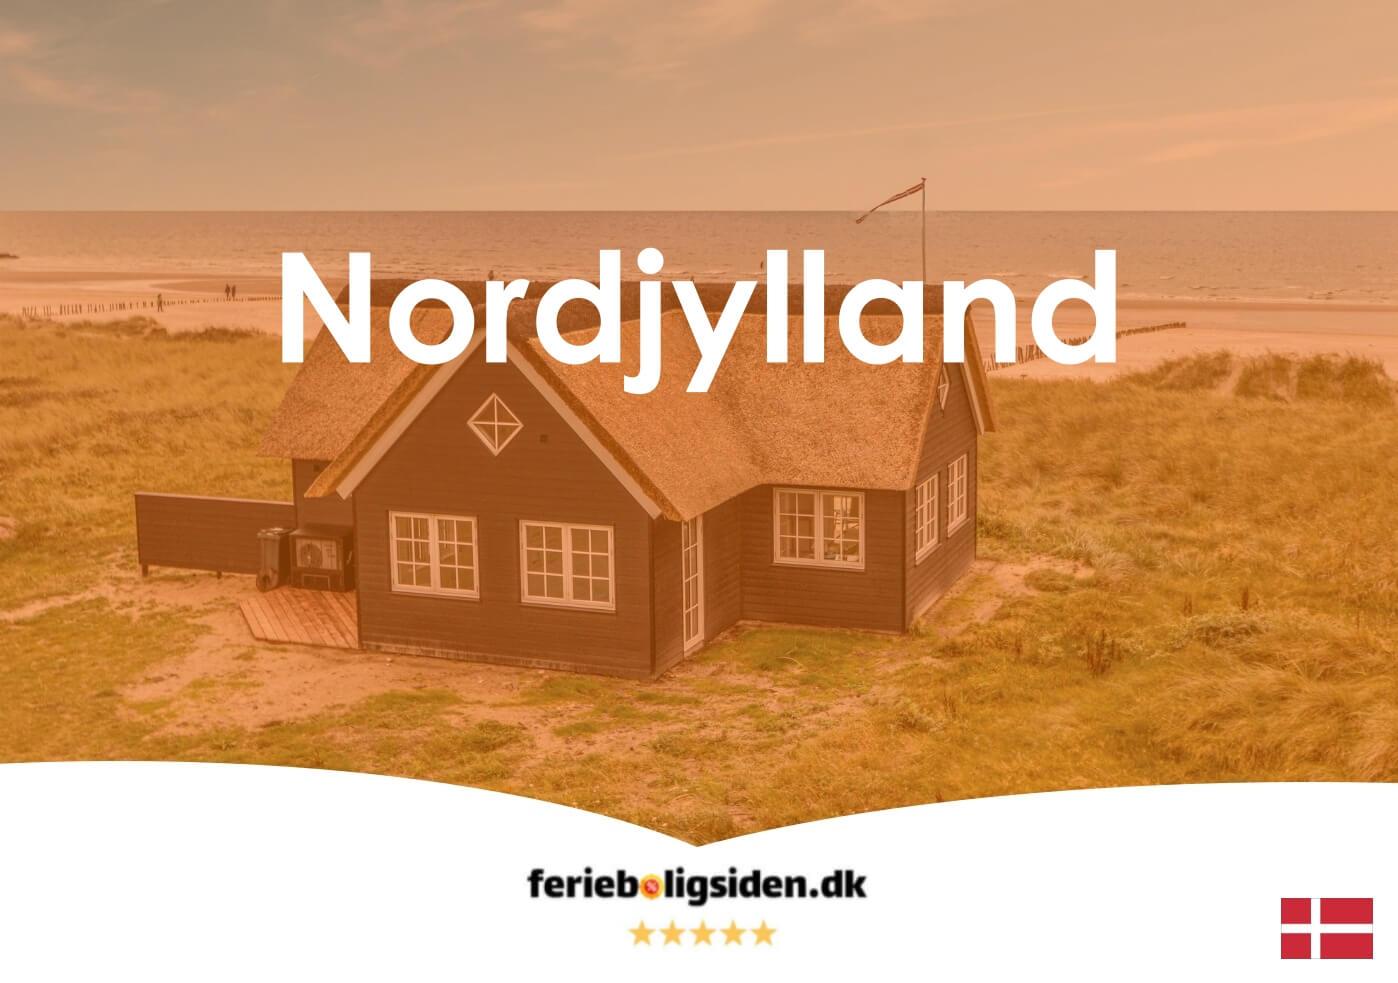 Sommerhus_i_nordjylland